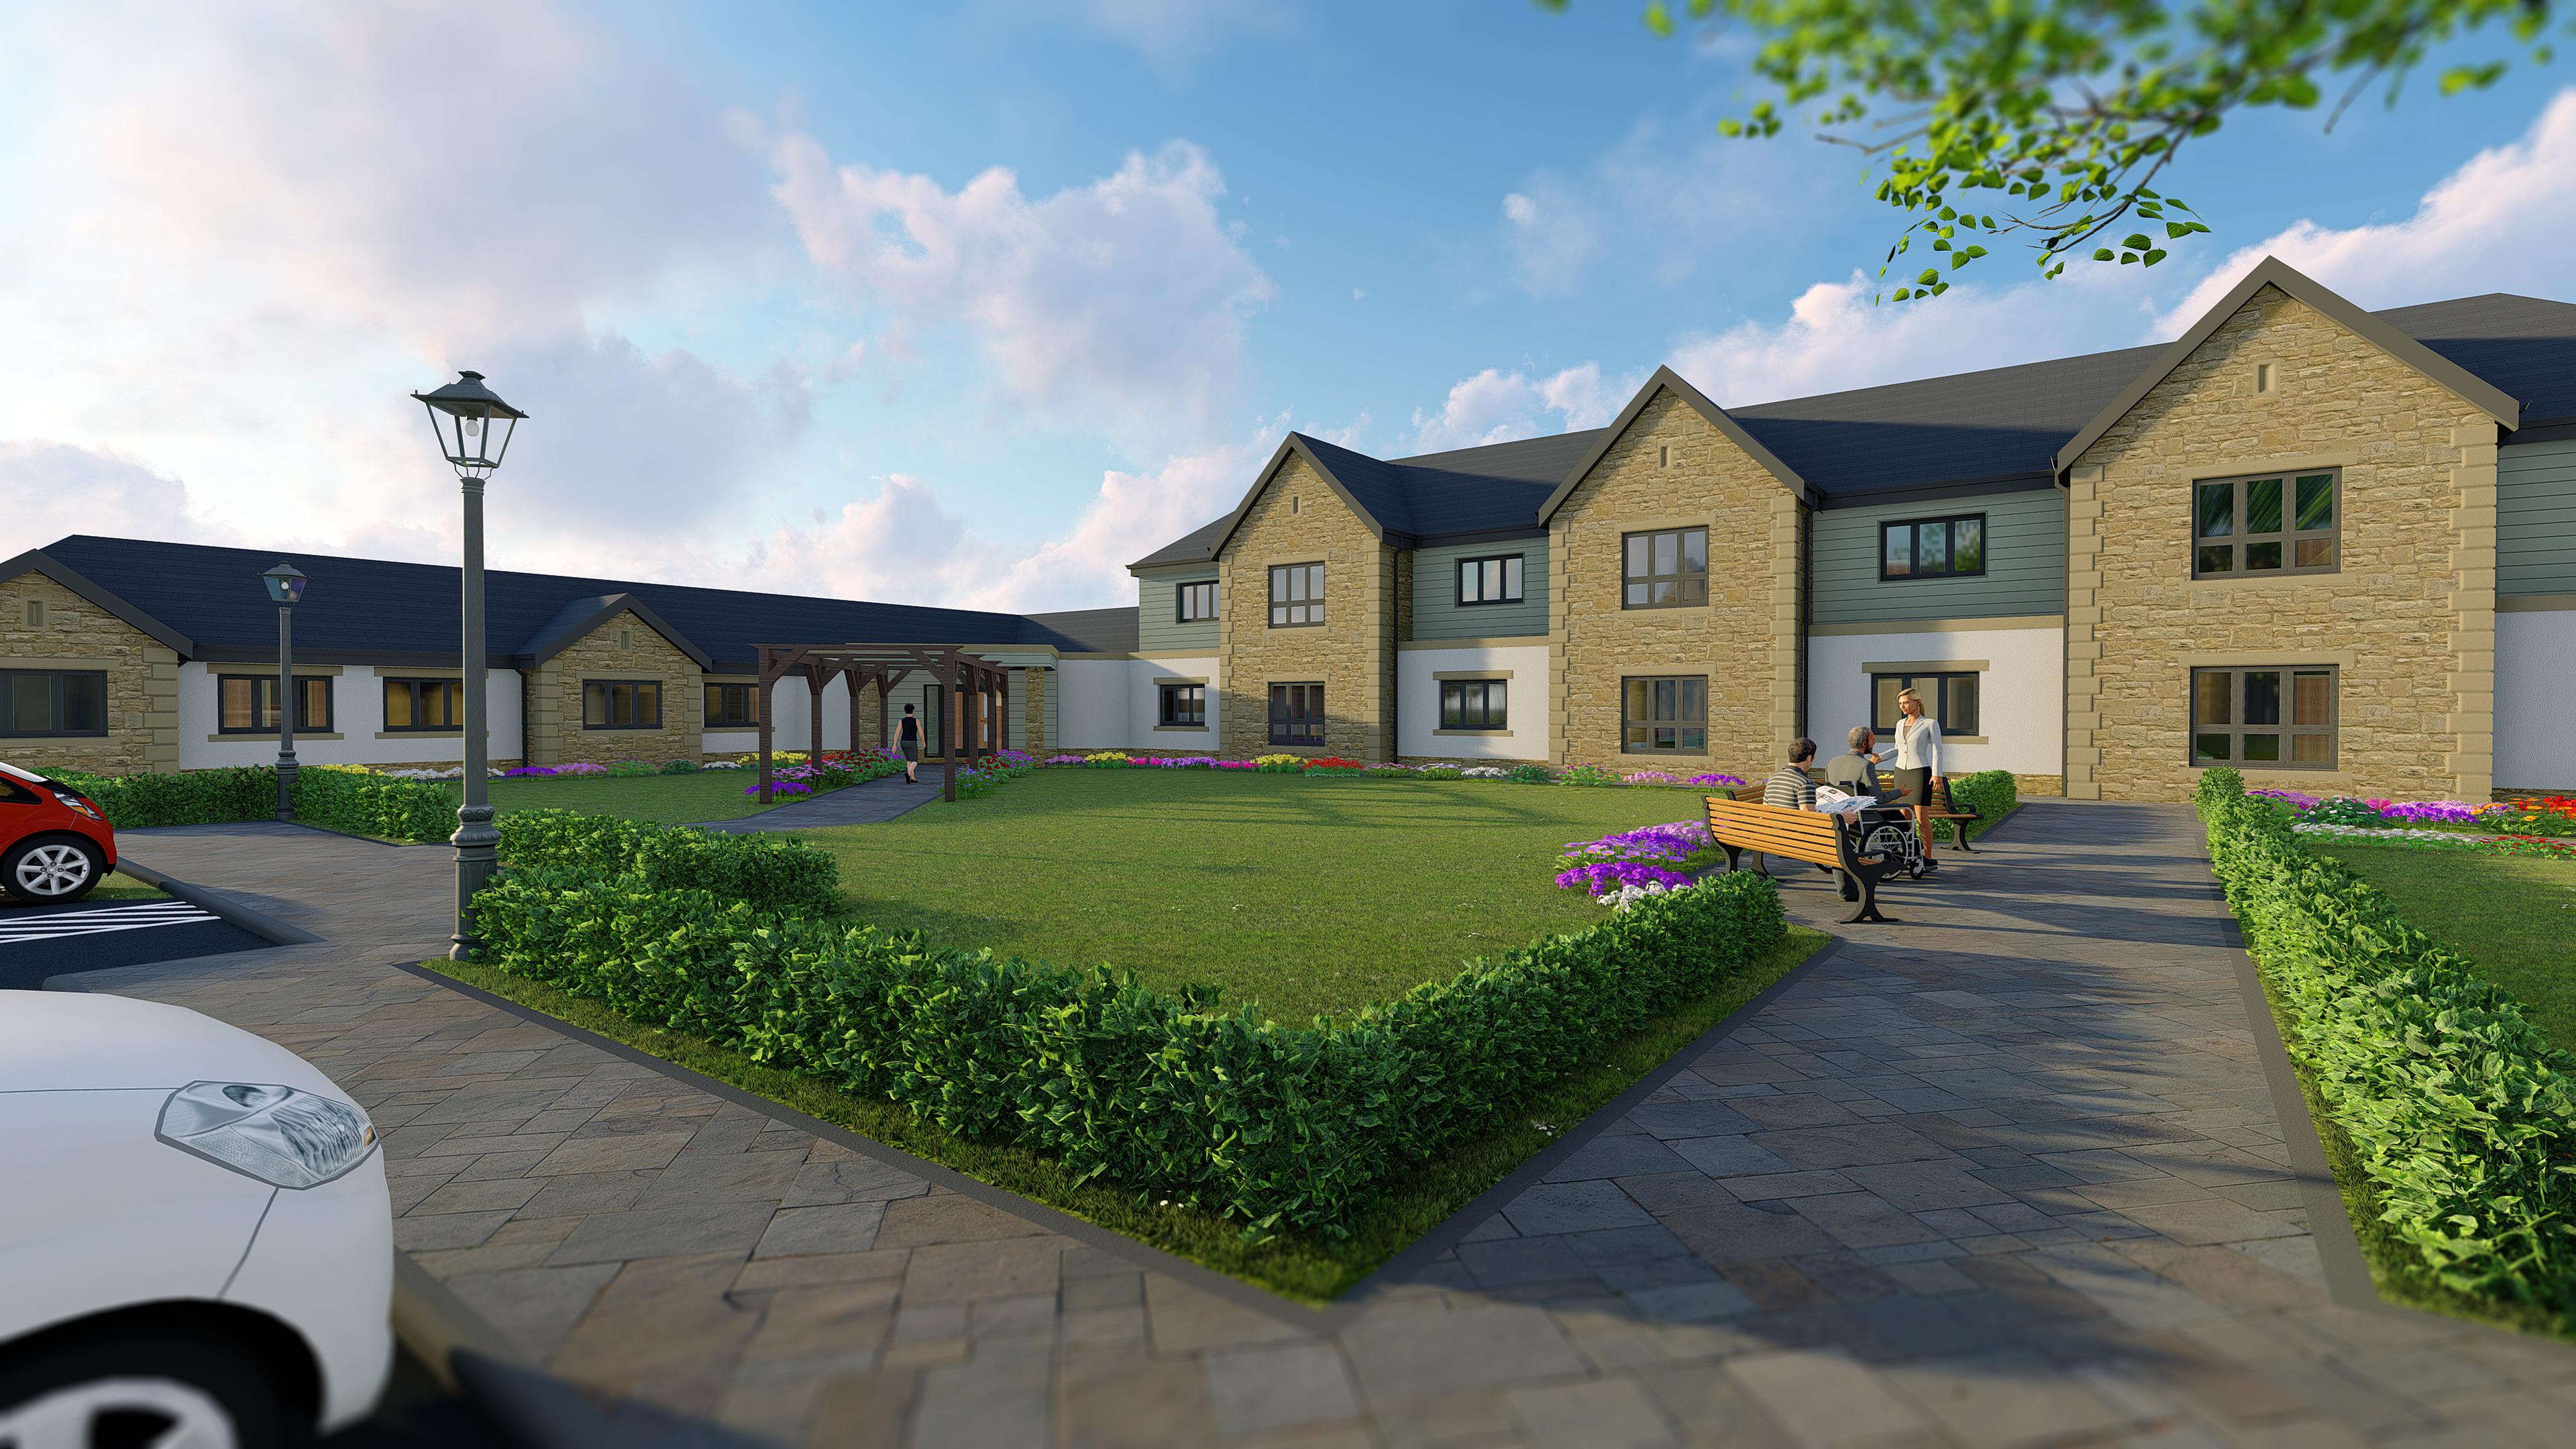 £4m Backworth care development approved